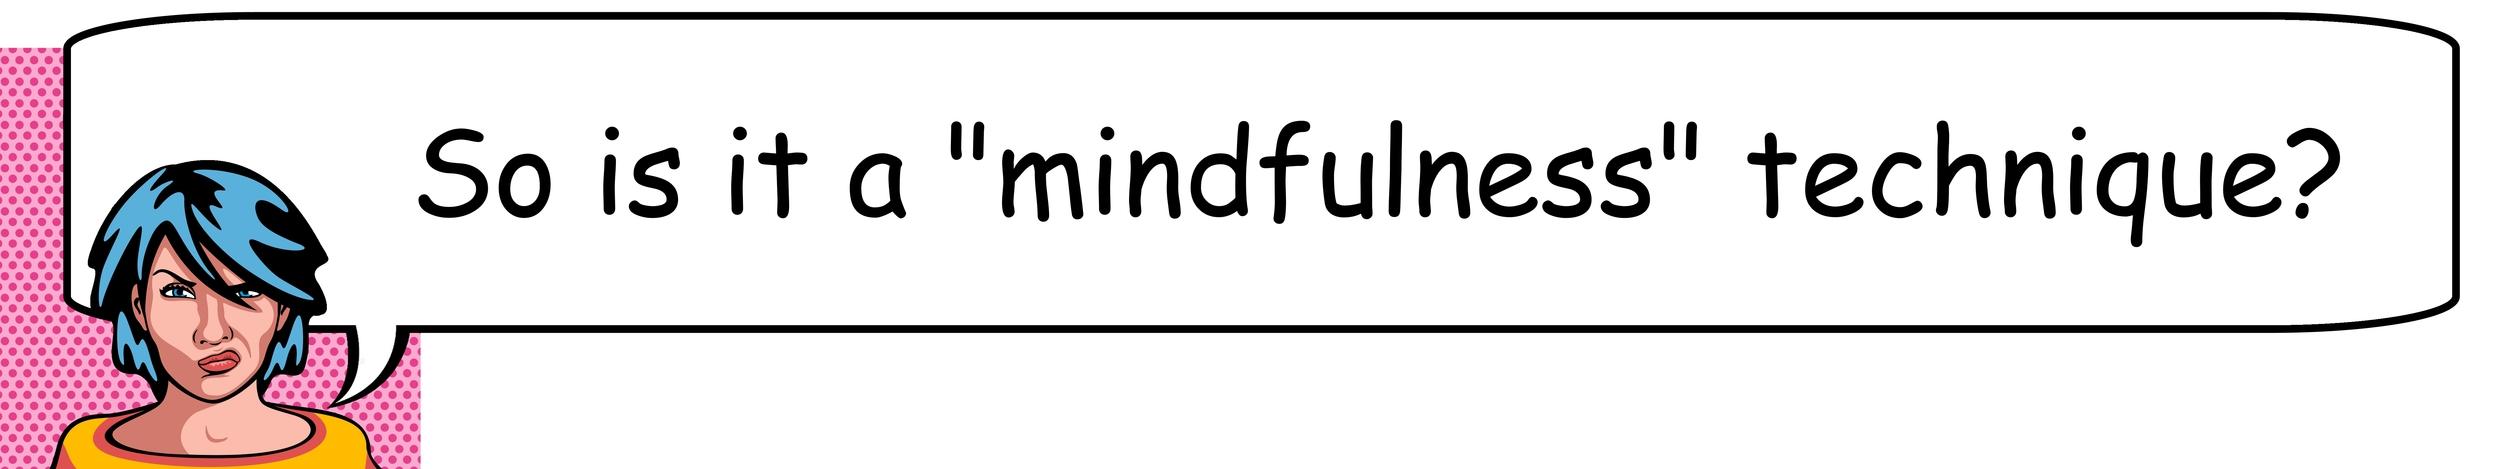 A mindfulness technique